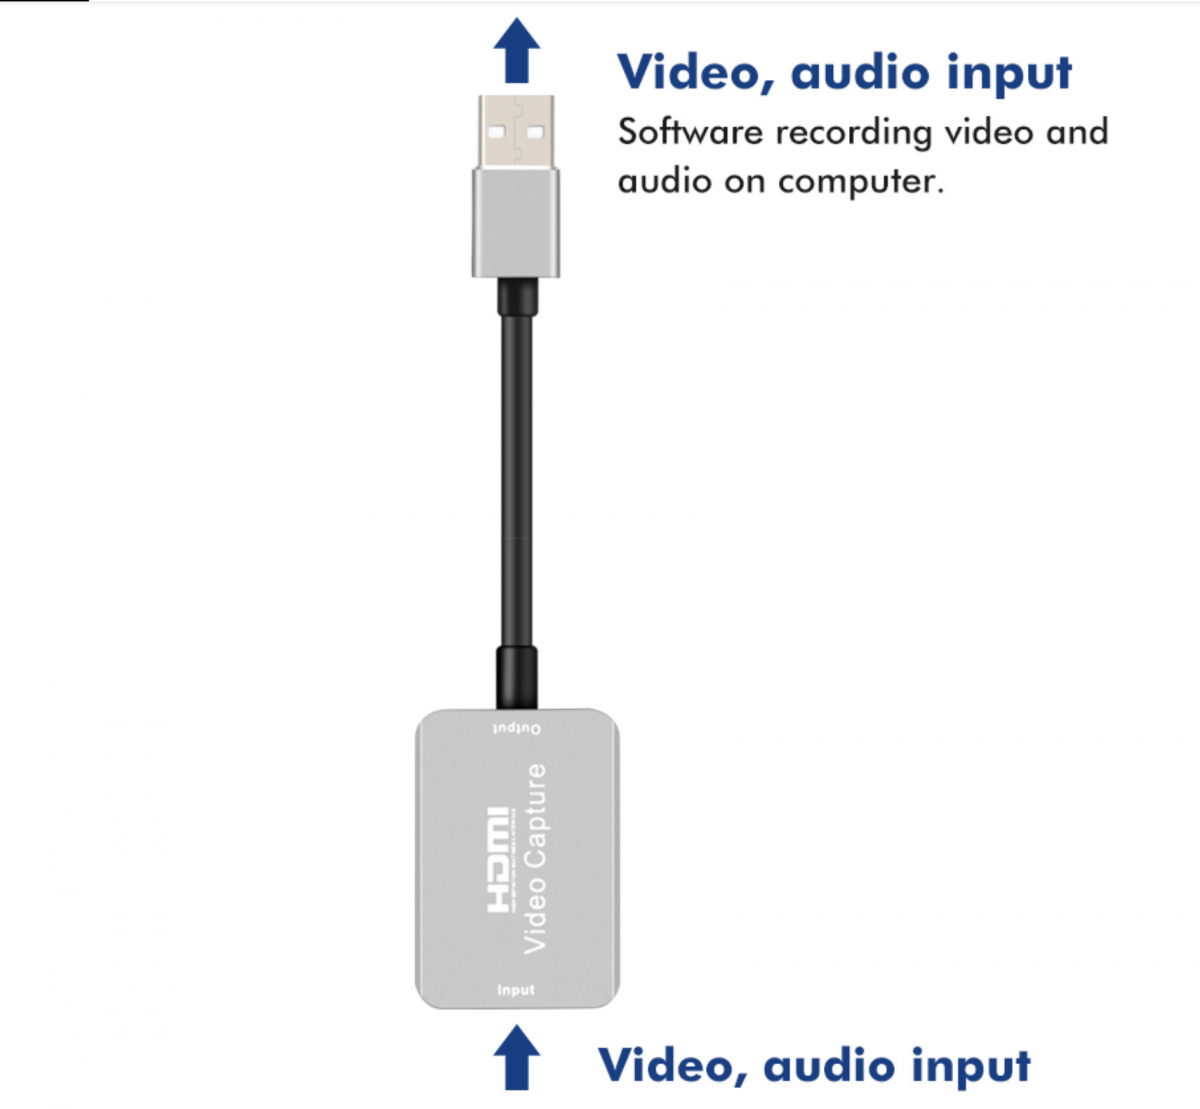 Карта захвата HDMI 1080P для записи игр на PC, Nintendo Switch, PS4, PS5, Xbox, Запись с экрана